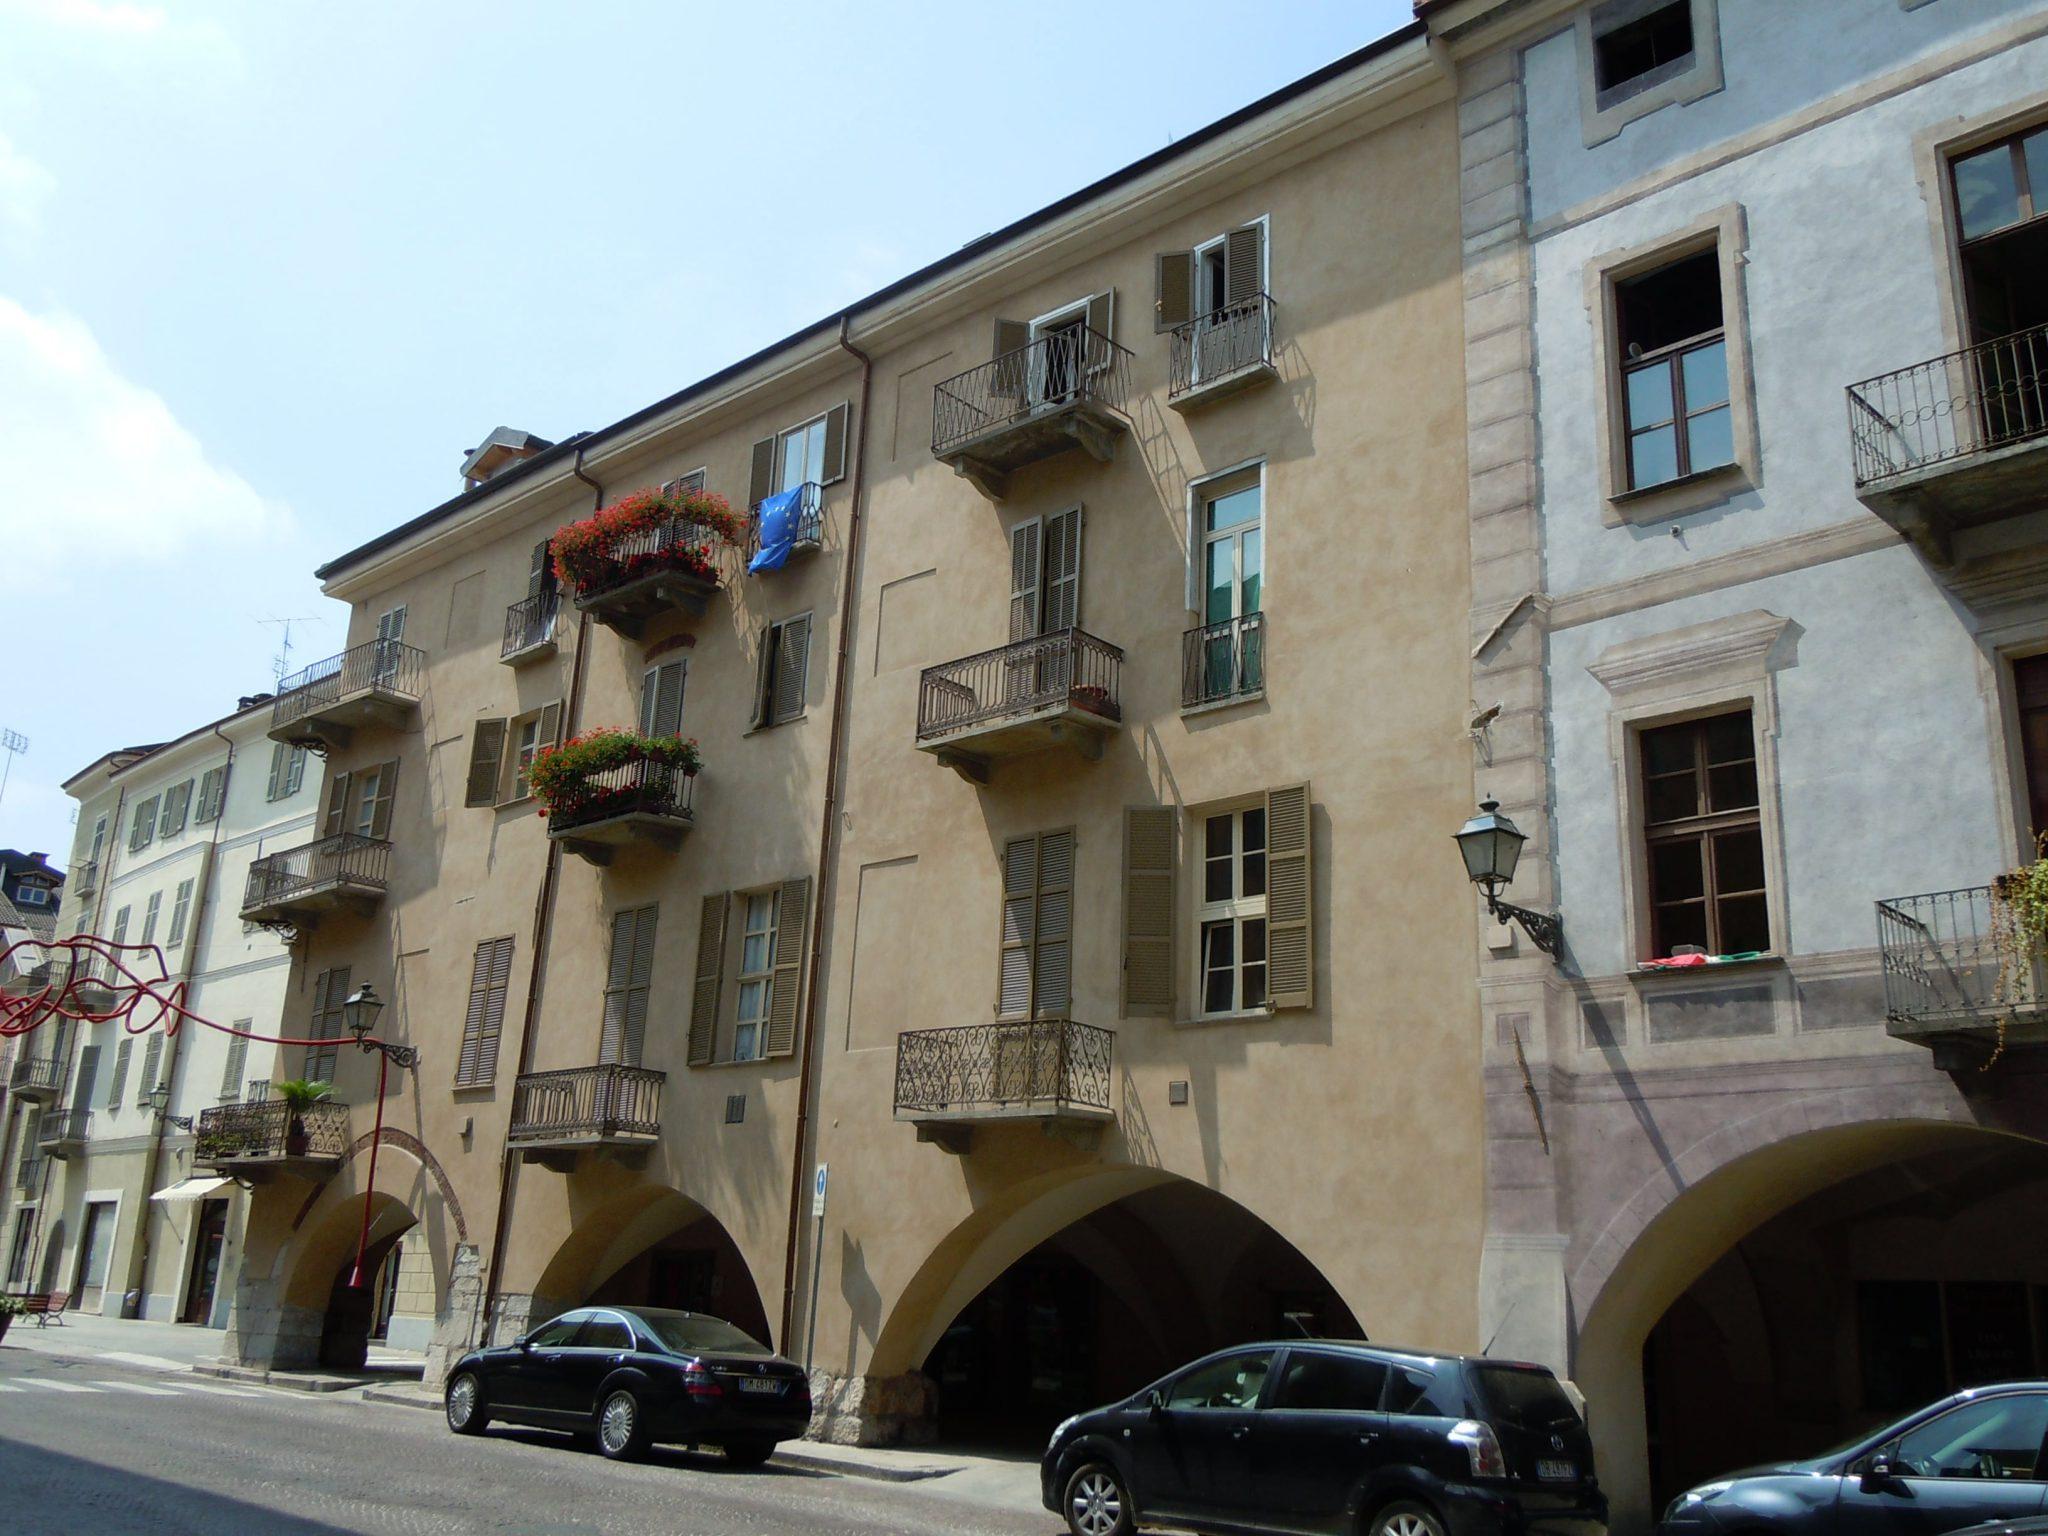 Via Roma – angolo Via Sette Assedi